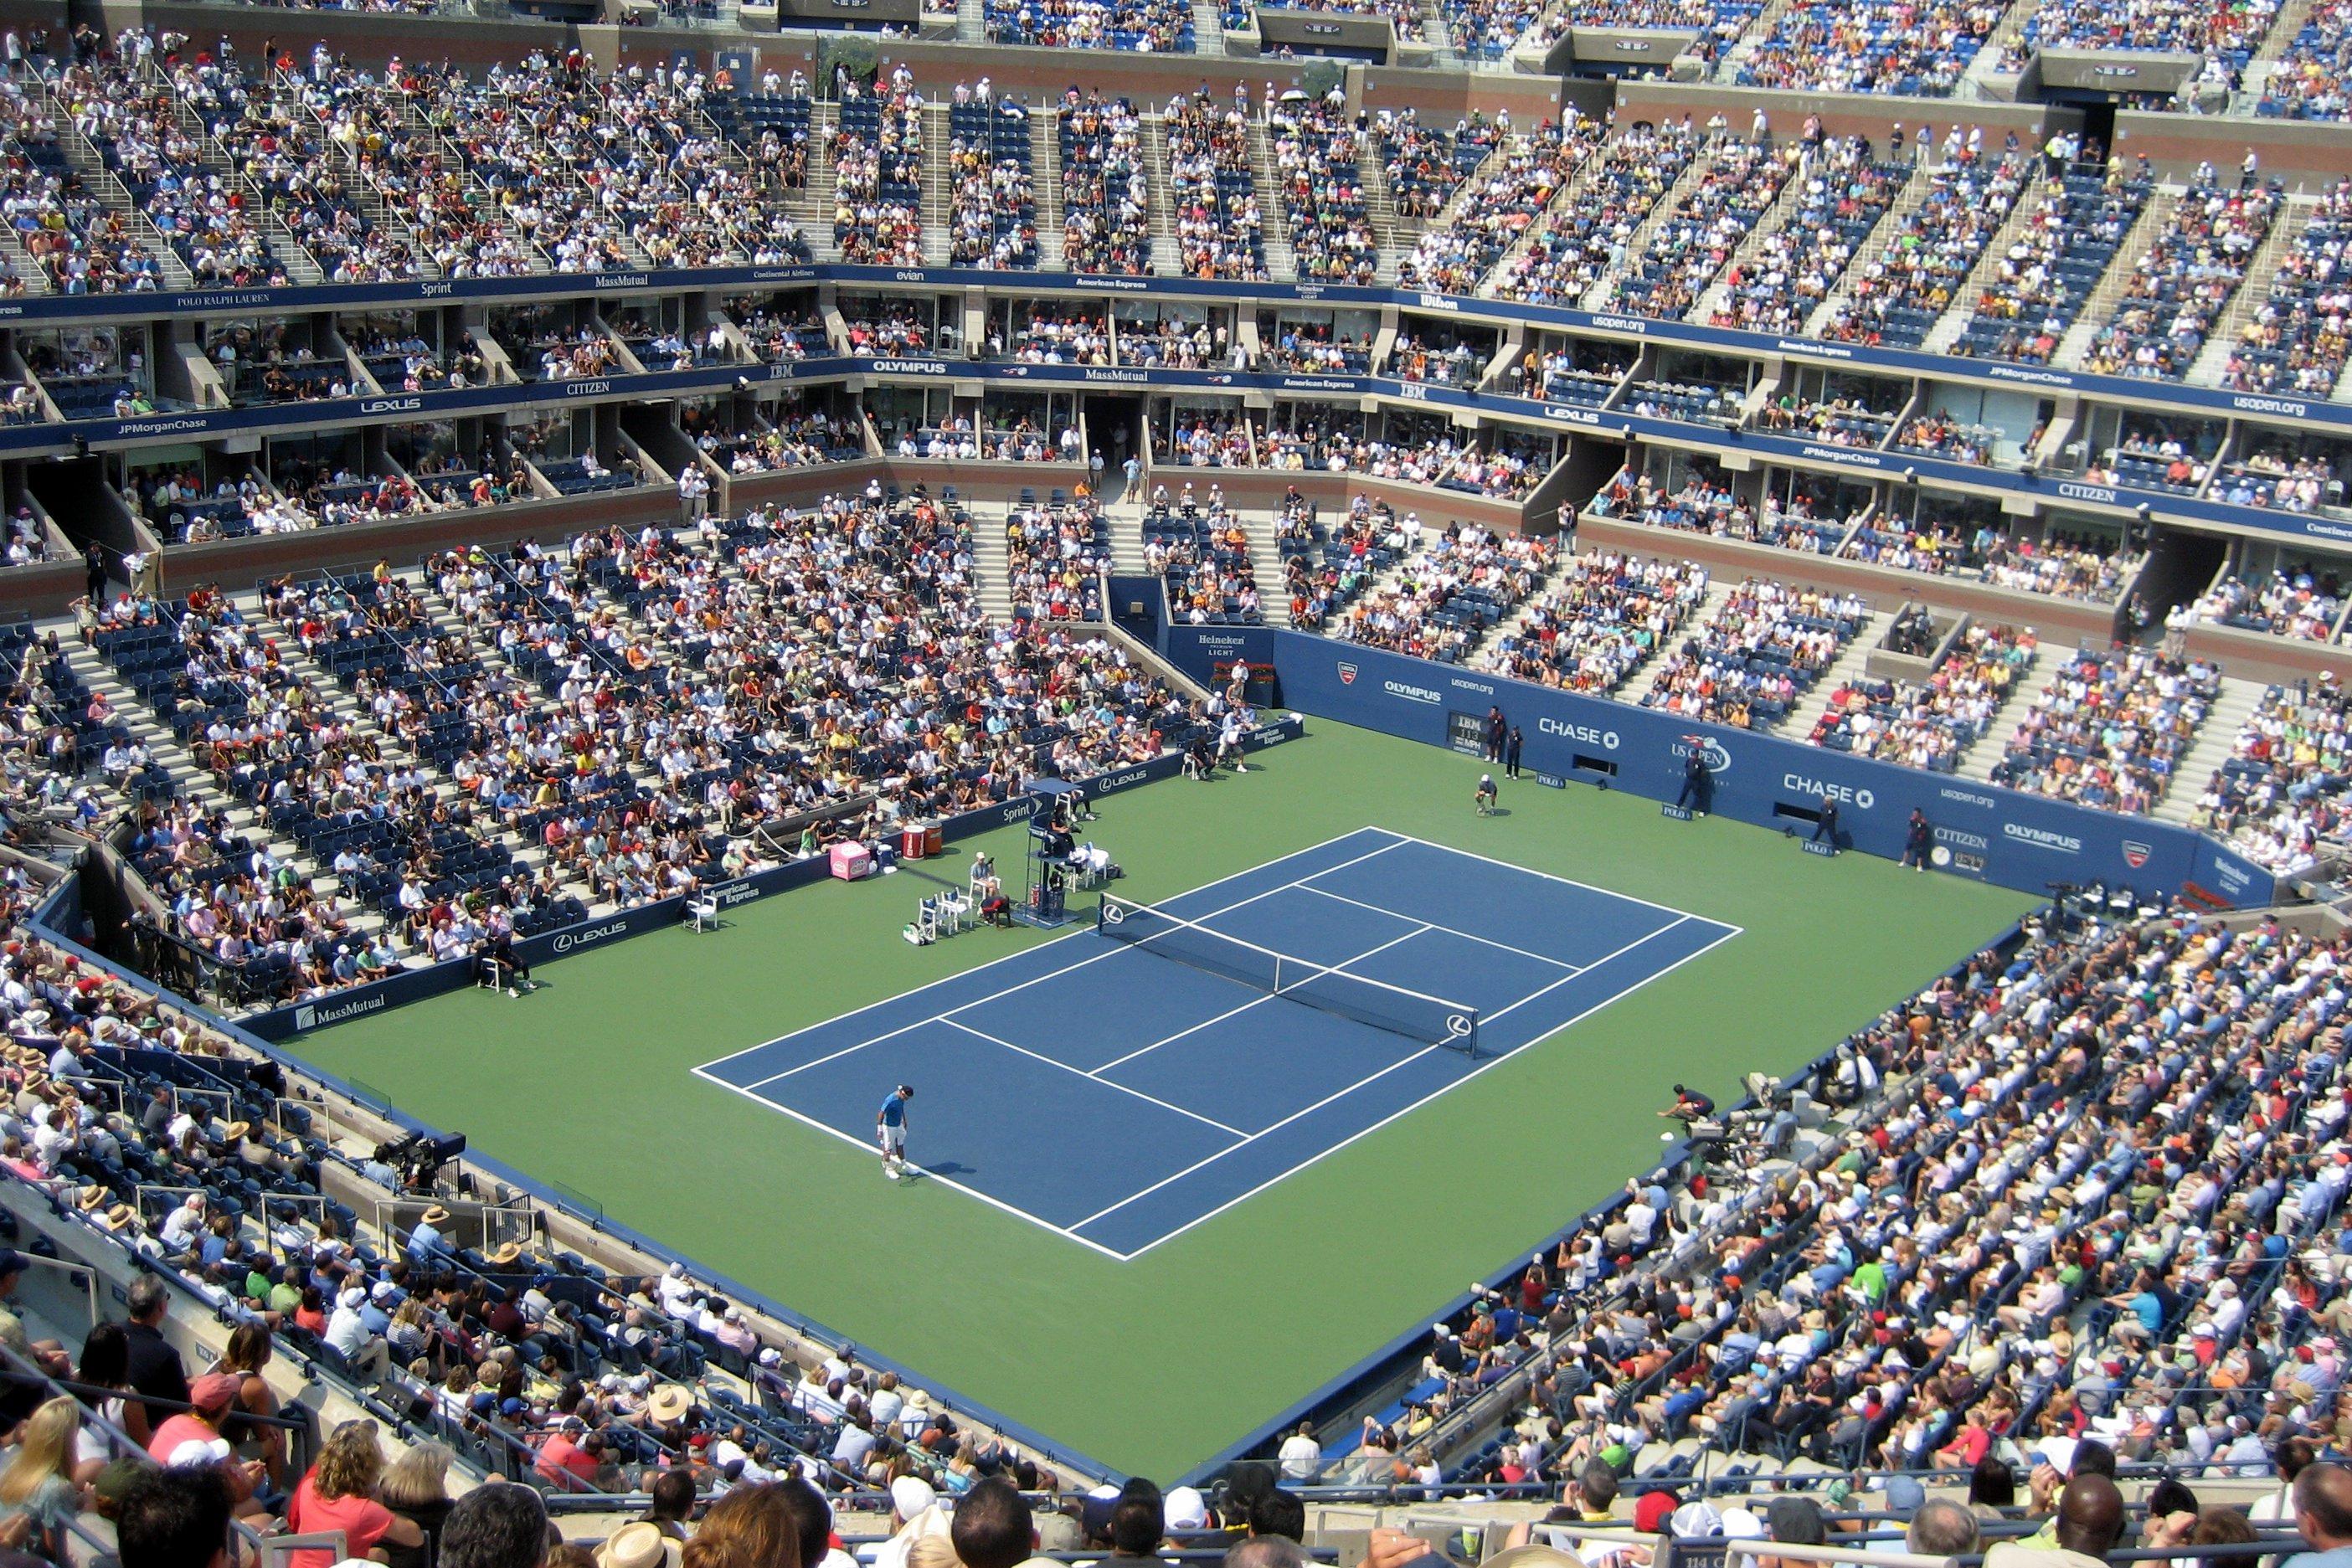 Map Of Arthur Ashe Stadium The Full Wiki - Us Open Tennis Map